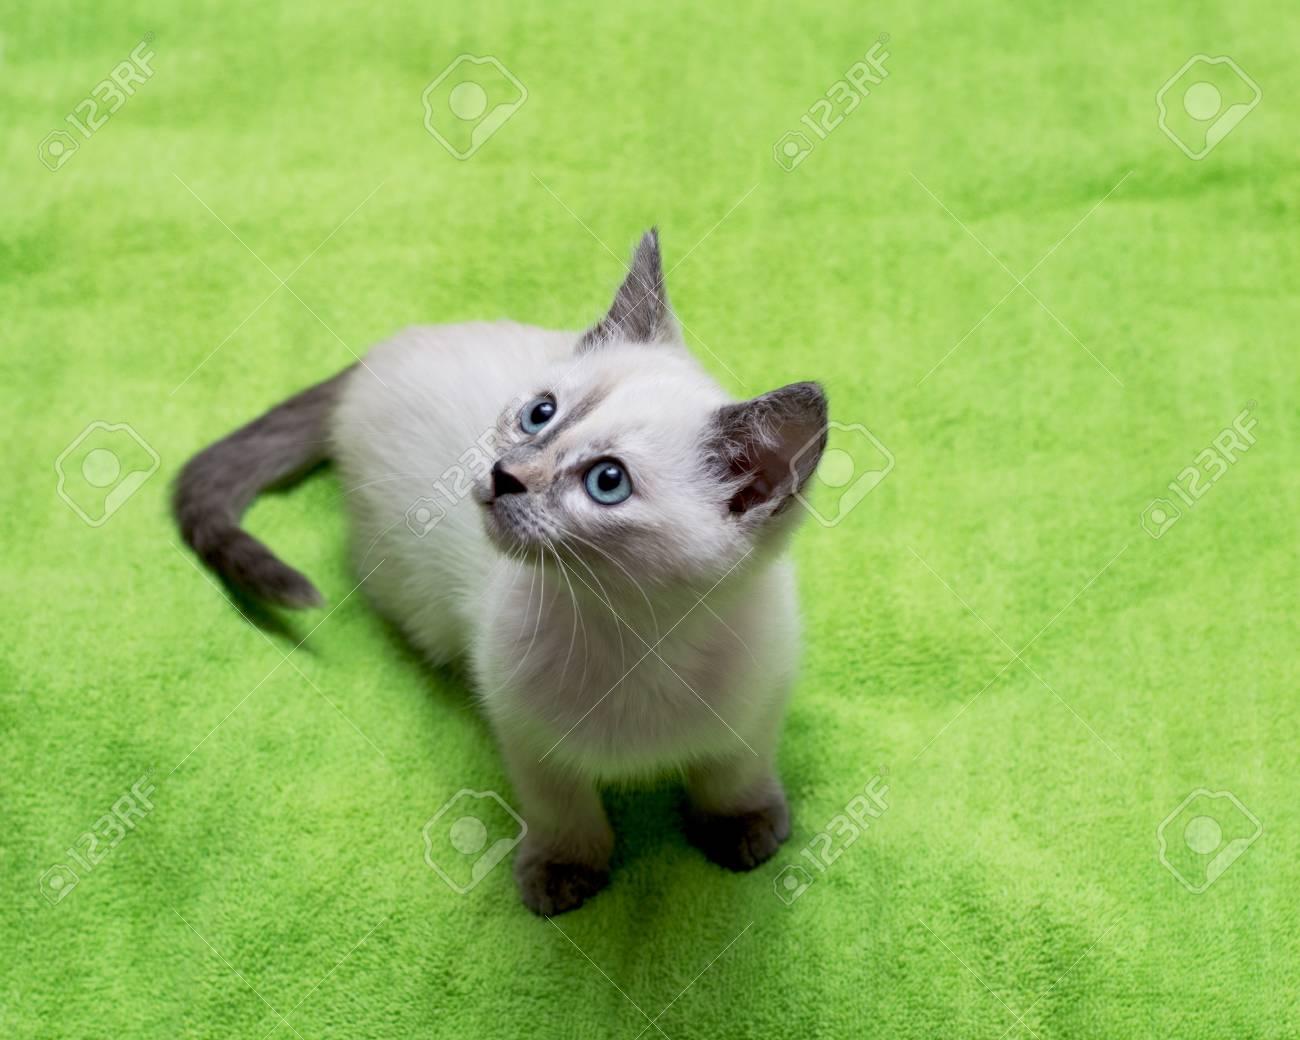 377c765f45 Beautiful White Kitten With Blue Eyes